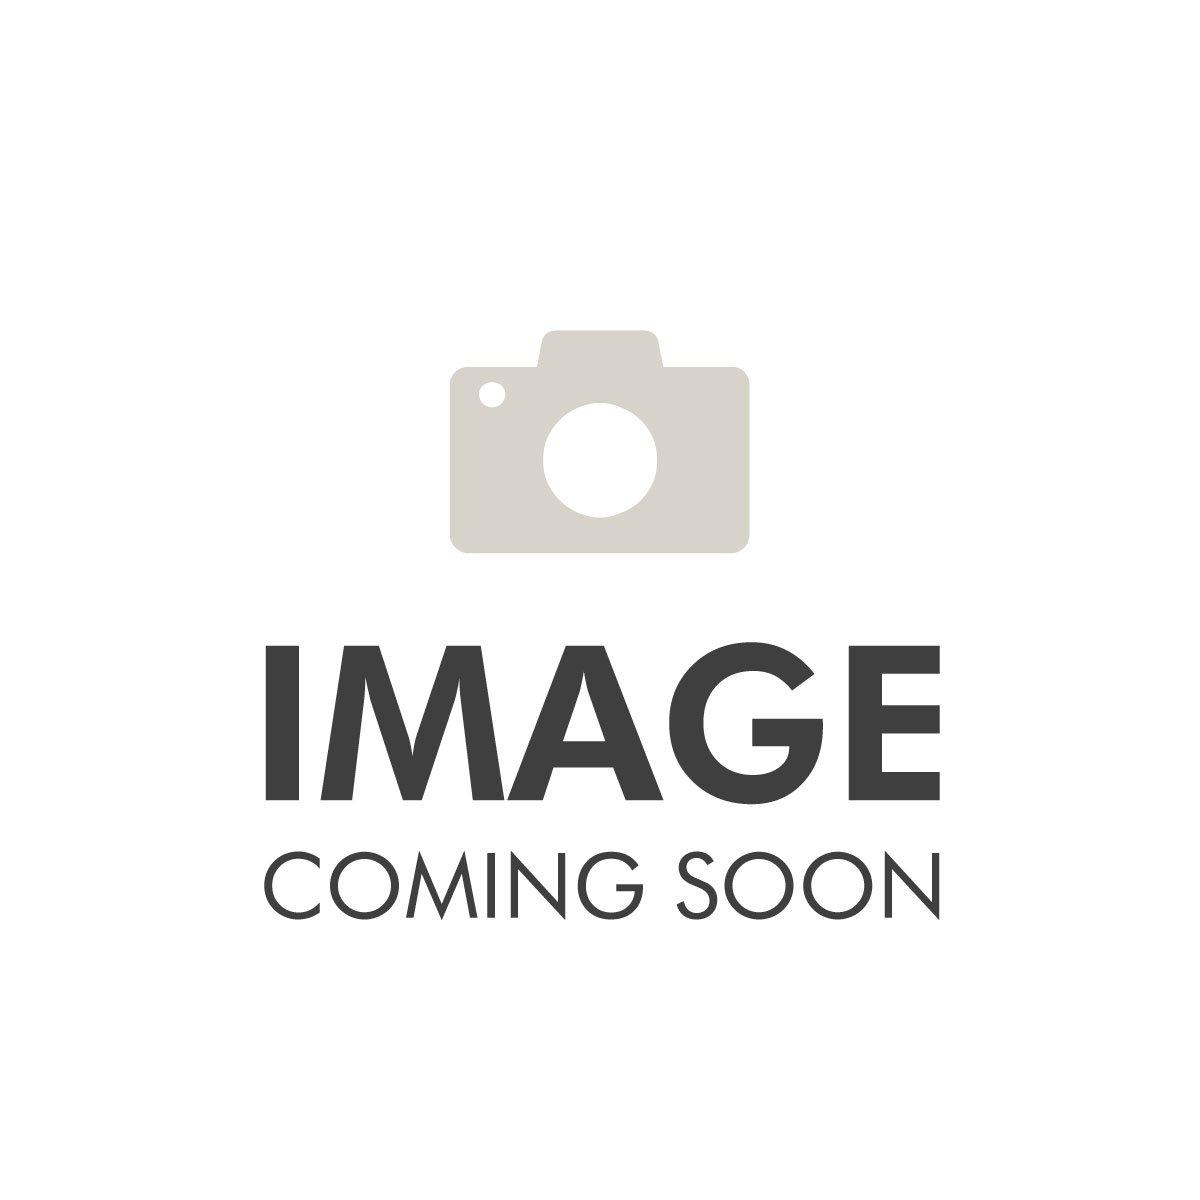 Naj Oleari #171 Nail Polish Color Emotion 8ml